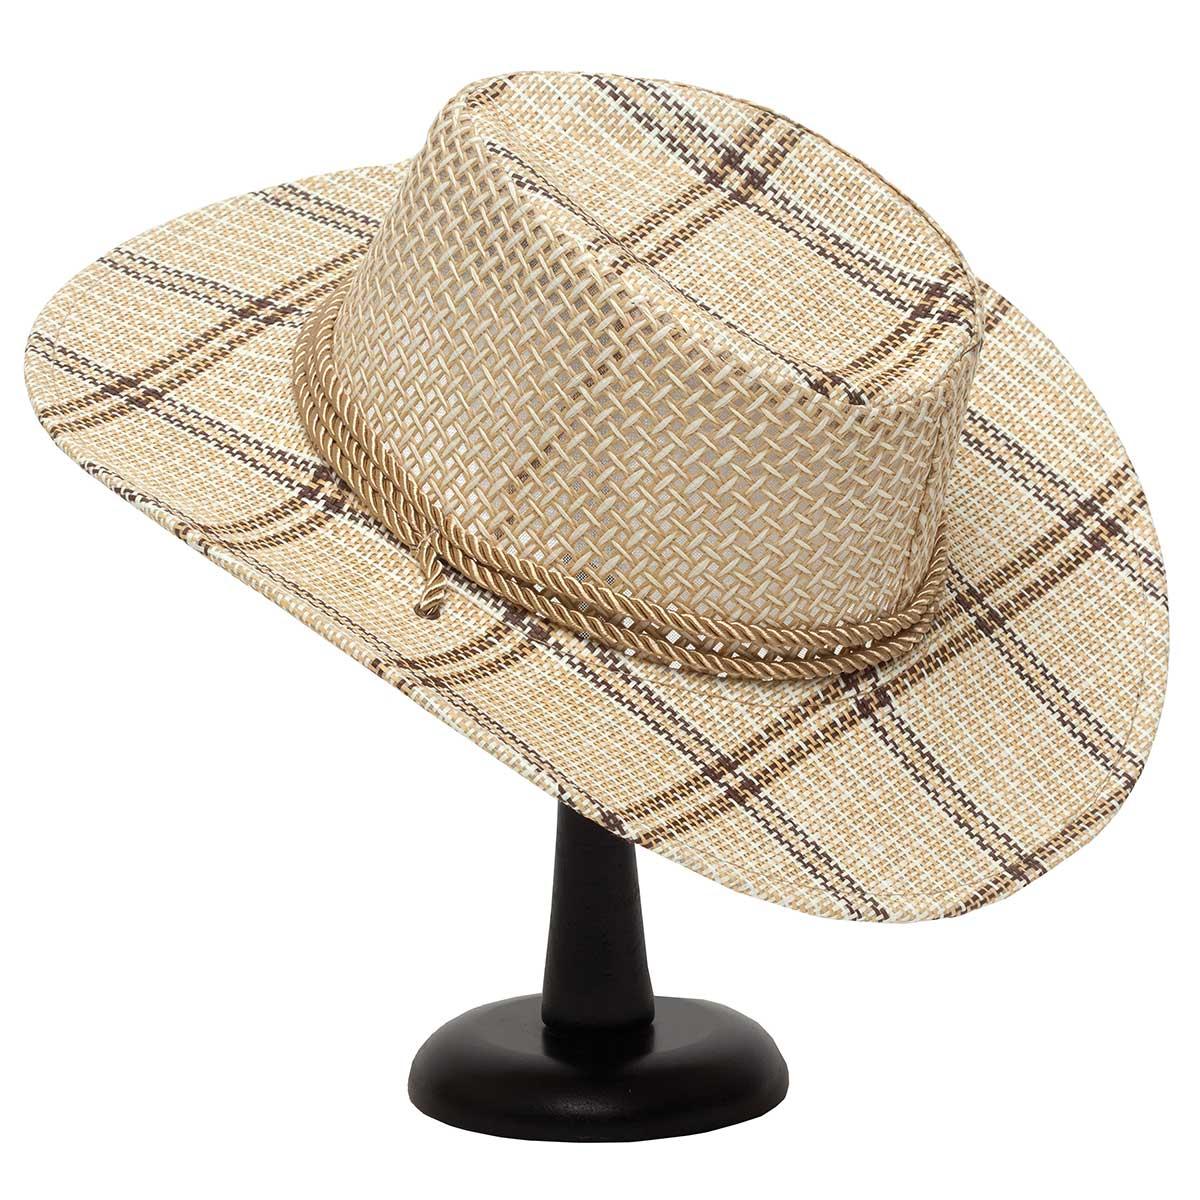 Tan Mesh Crown Hat with Rope Trim and Plaid Brim 50sp